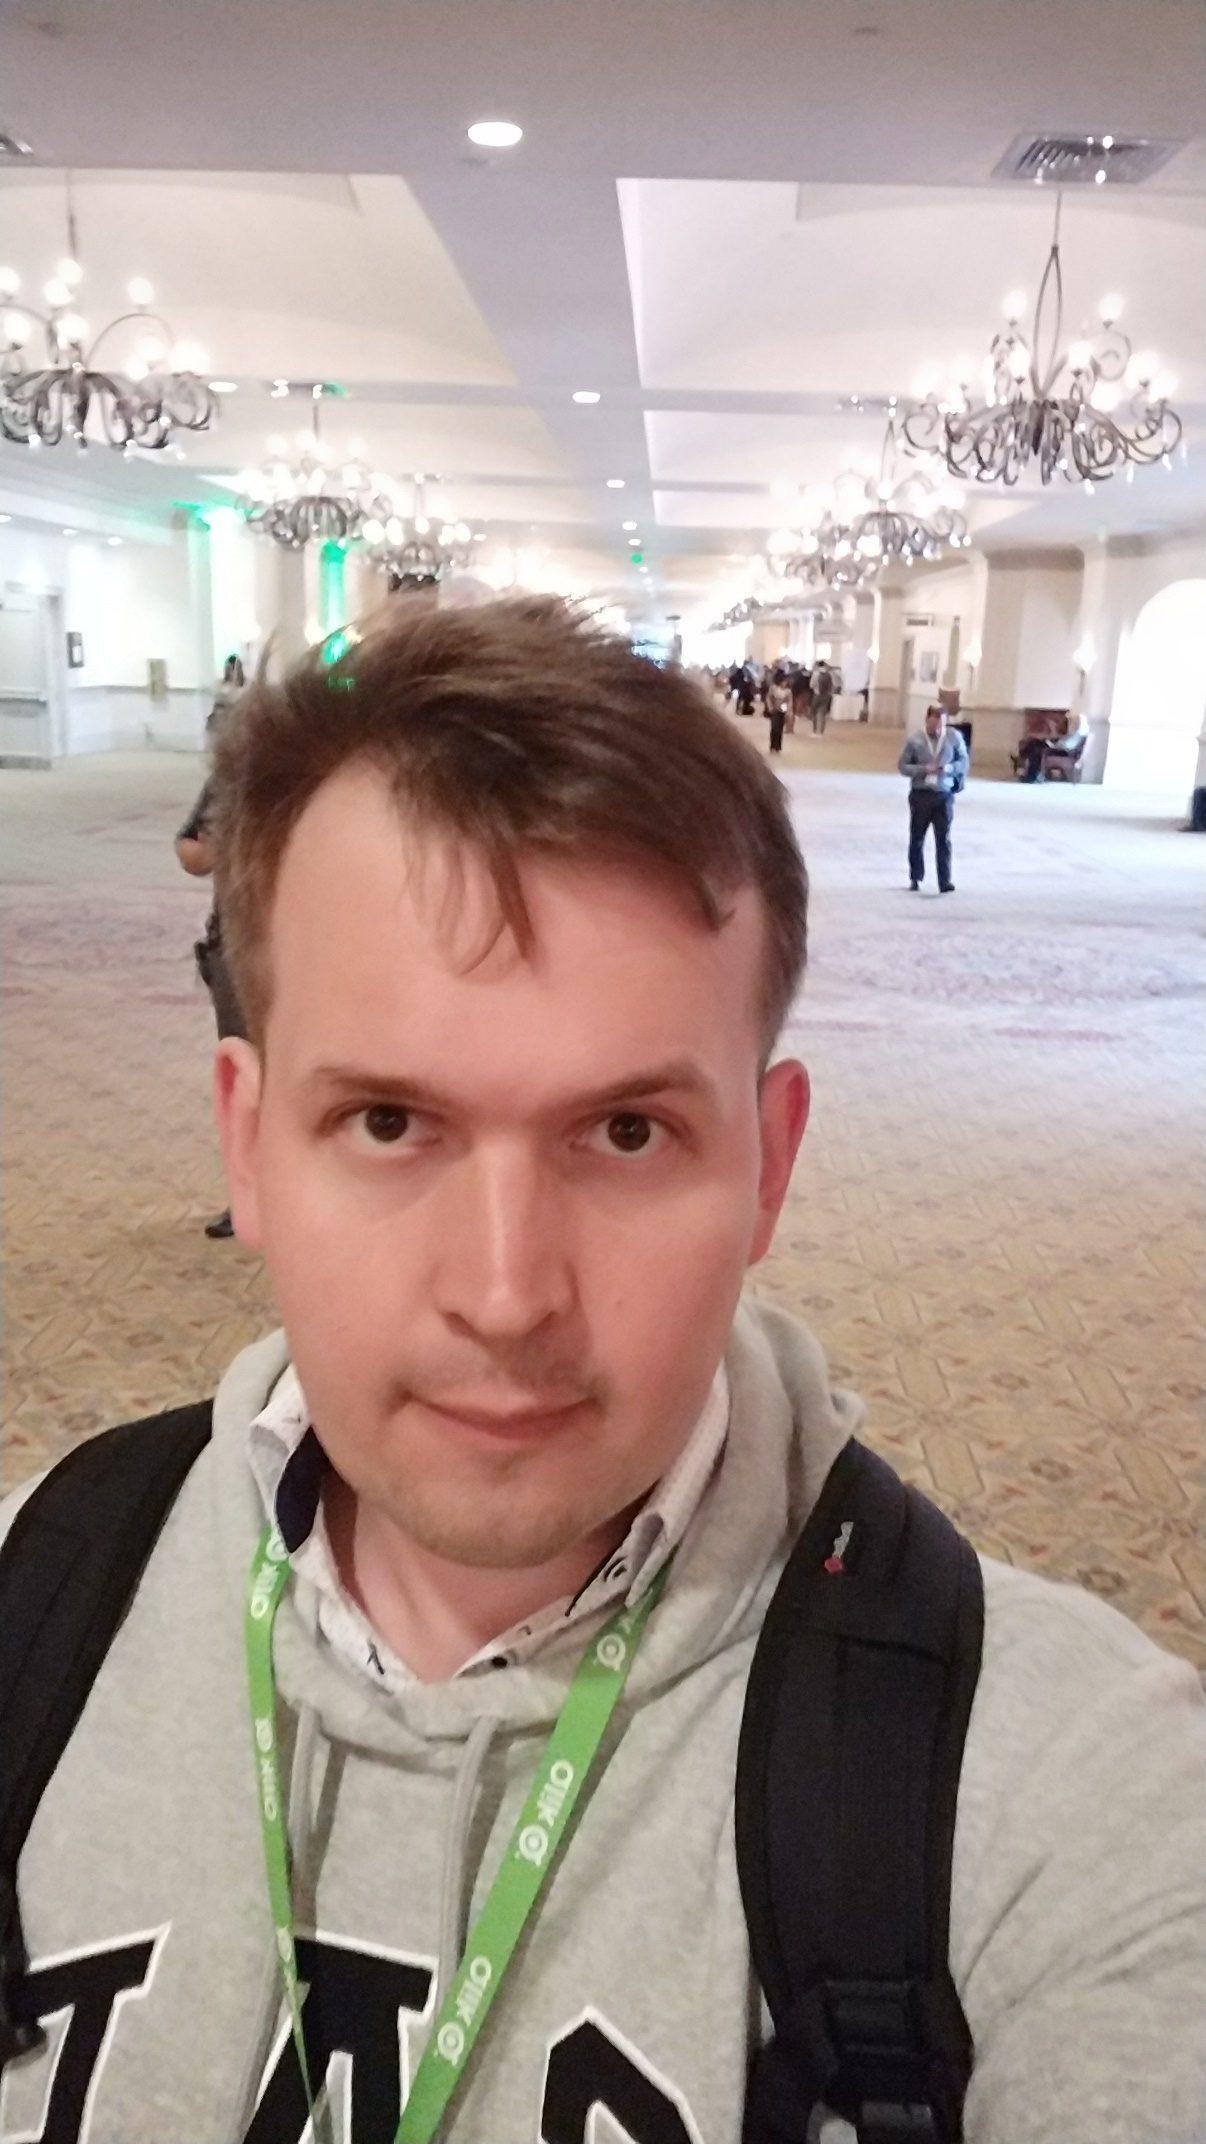 D:\QV\Qlik World Conference 2018\Photo\IMG_20180425_134611.jpg